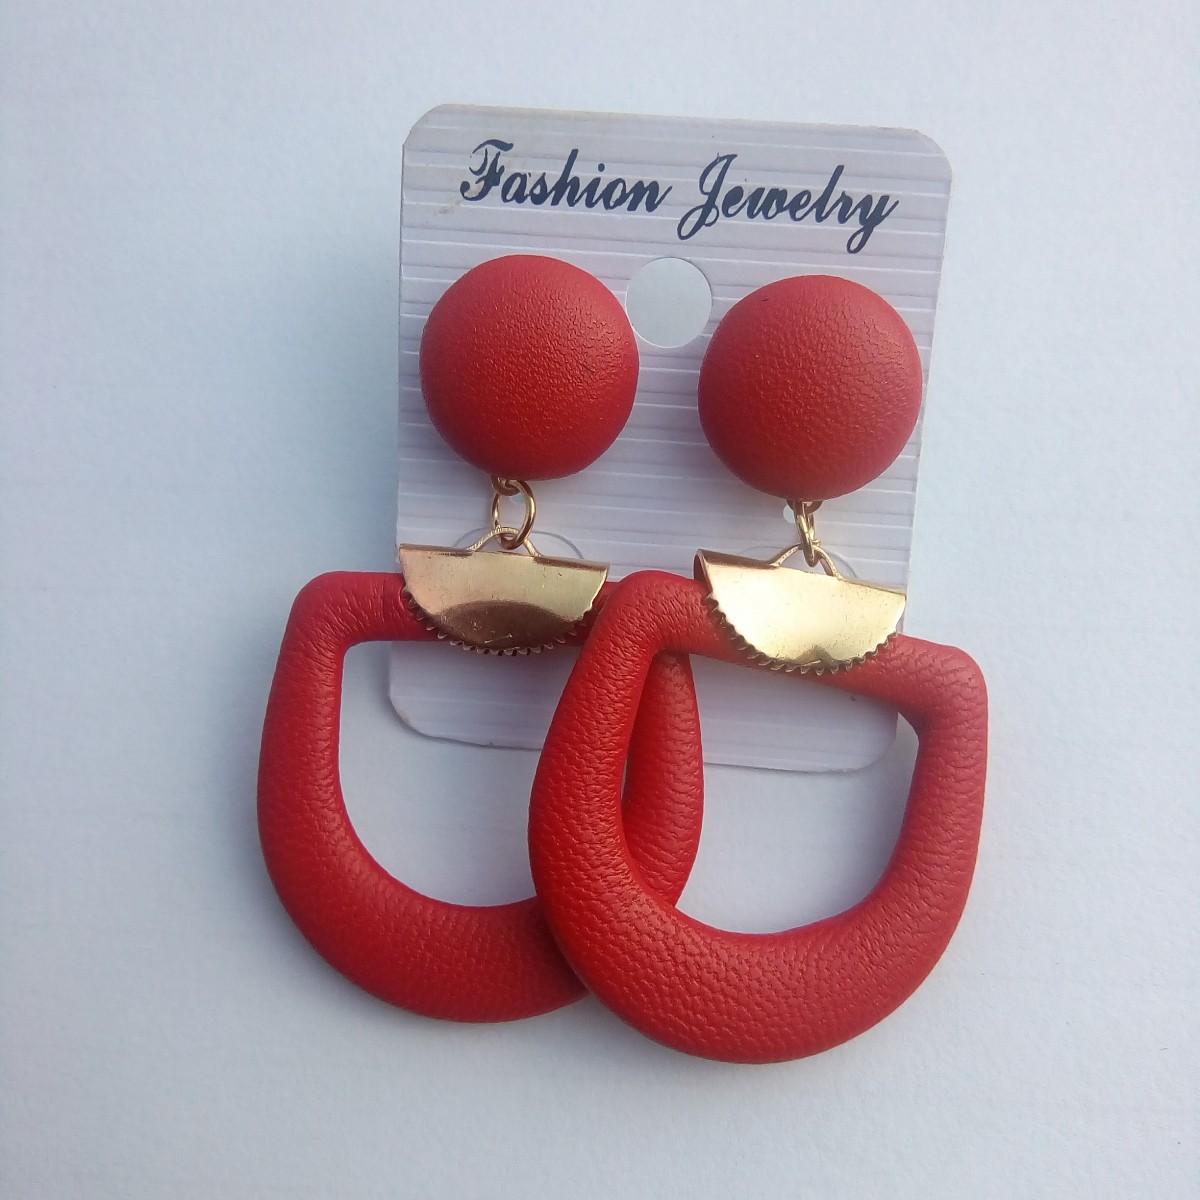 FDC fashion earrings image